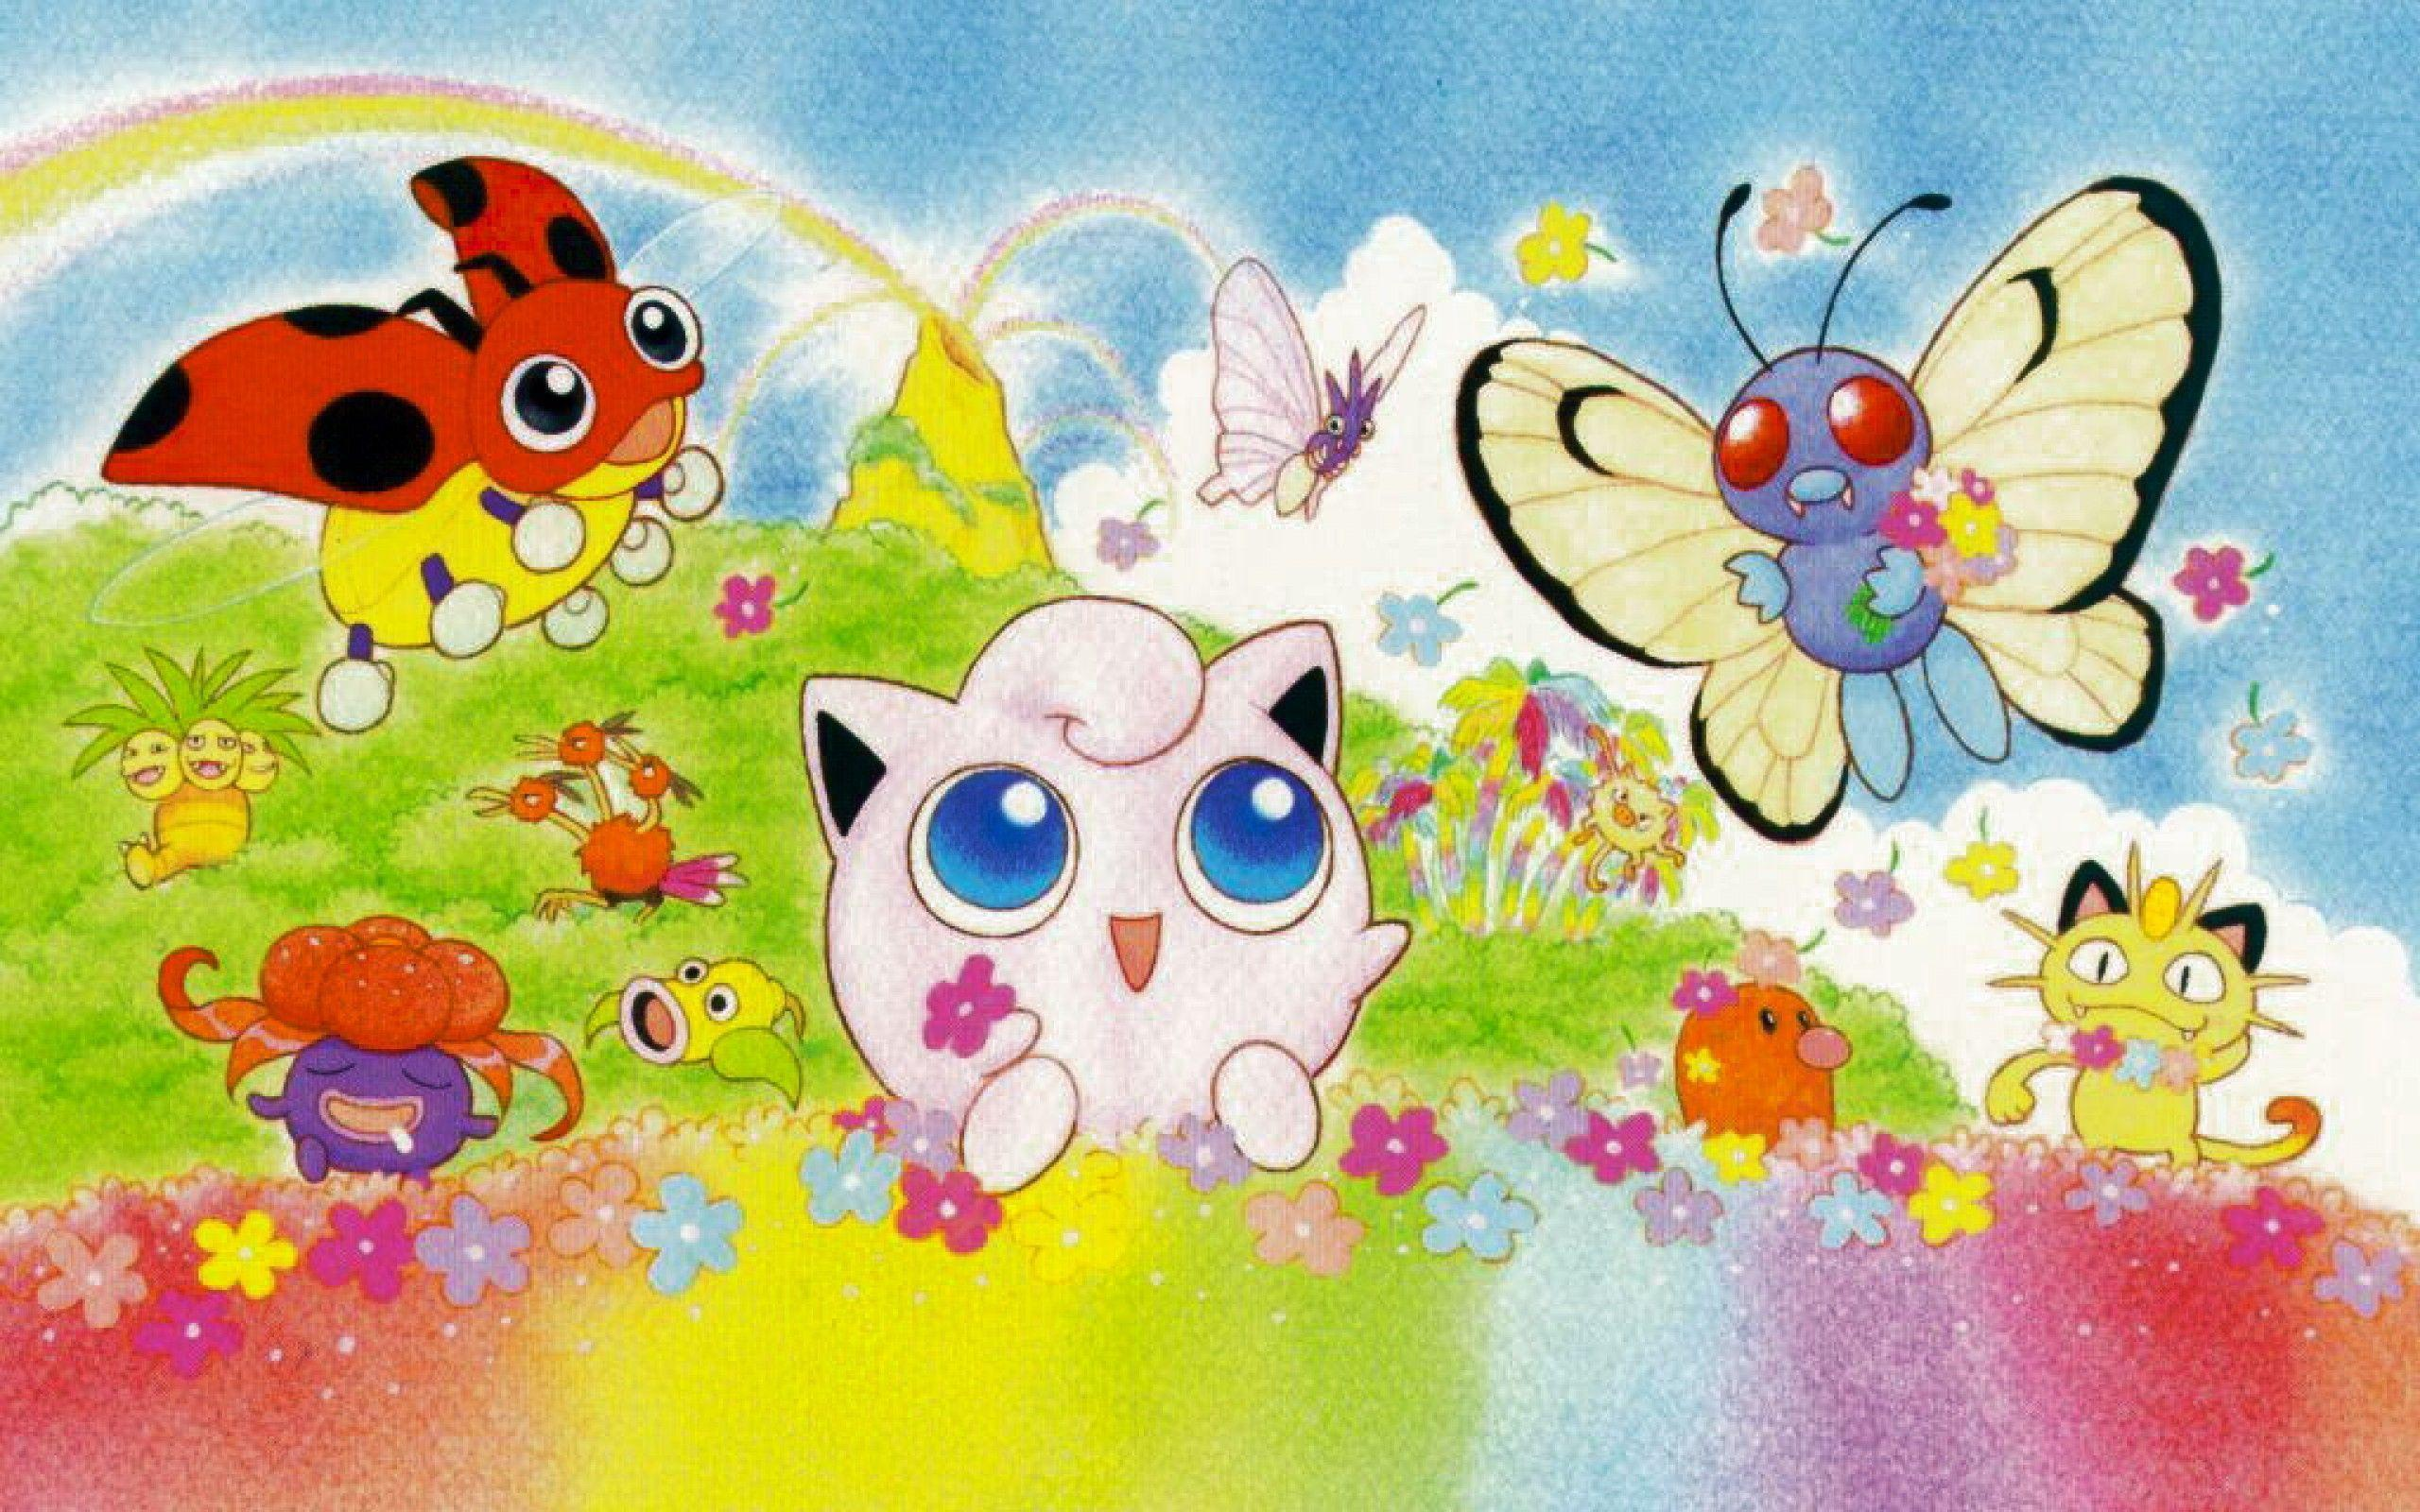 cute pokemon wallpaper 5599 - photo #14